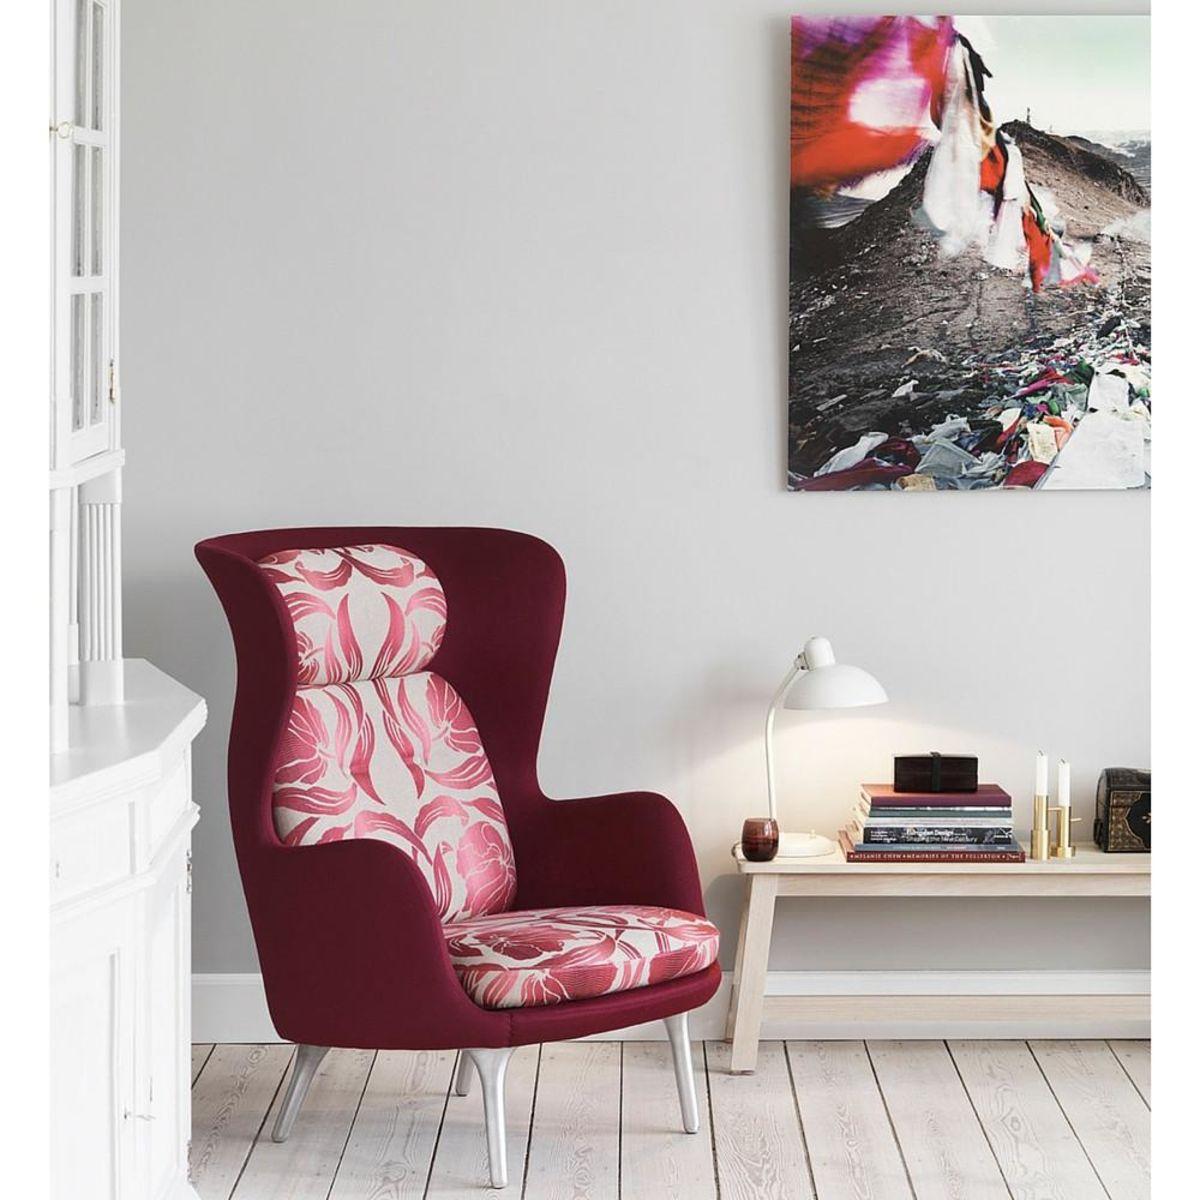 Ro armchair by Fritz Hansen